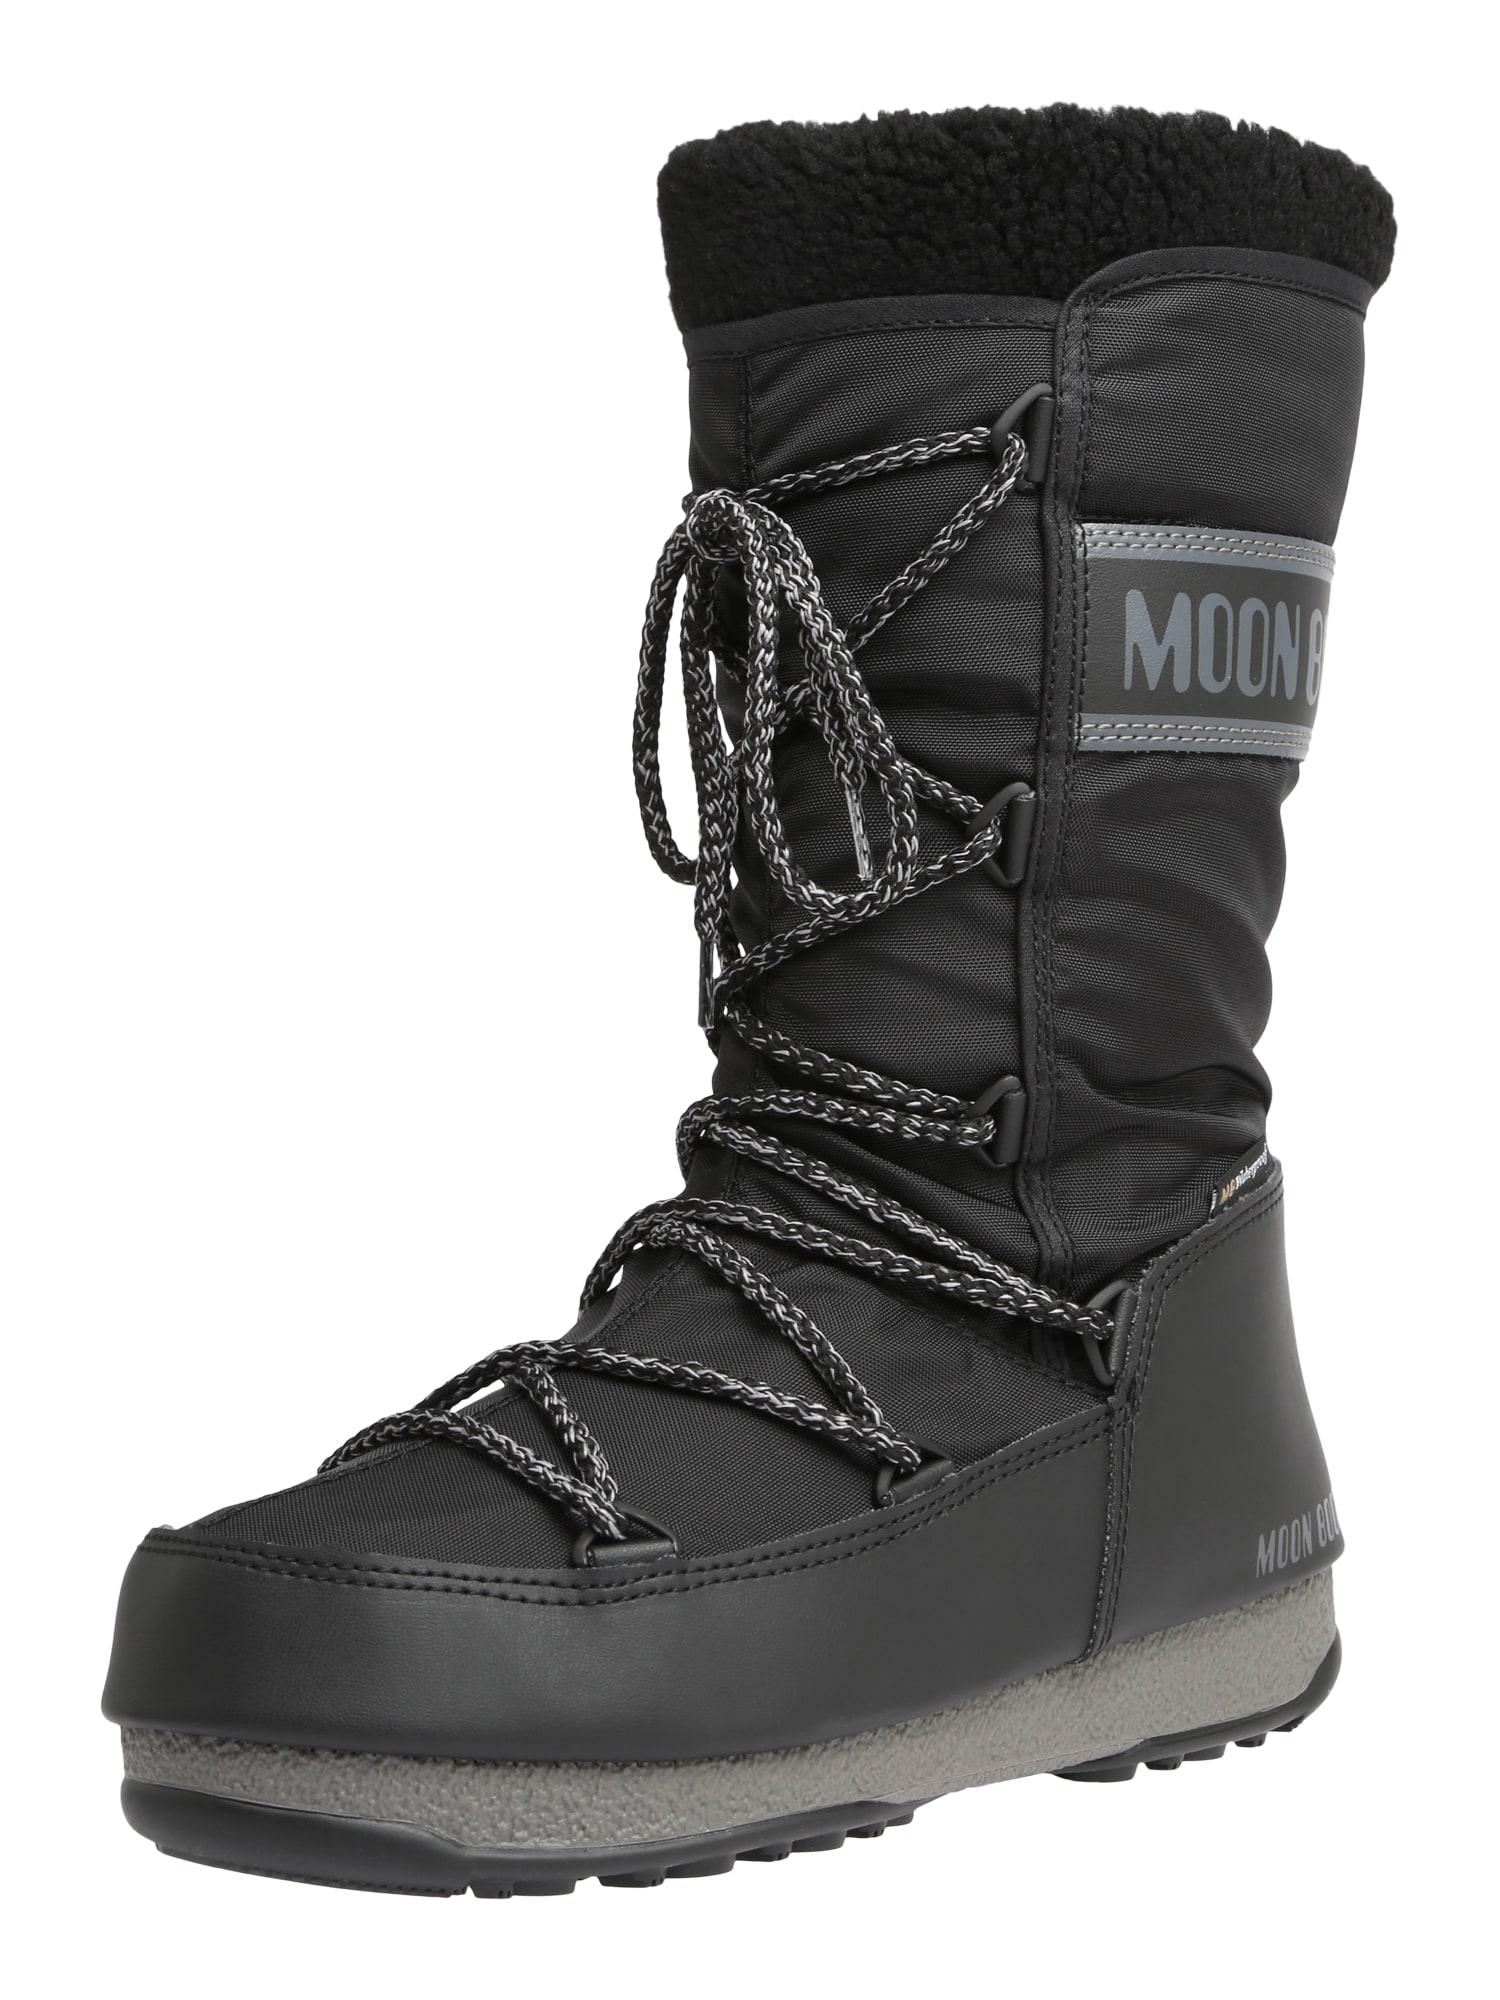 Snowboots 'MOON BOOT MONACO WOOL WP' | Schuhe > Boots > Snowboots | moon boot